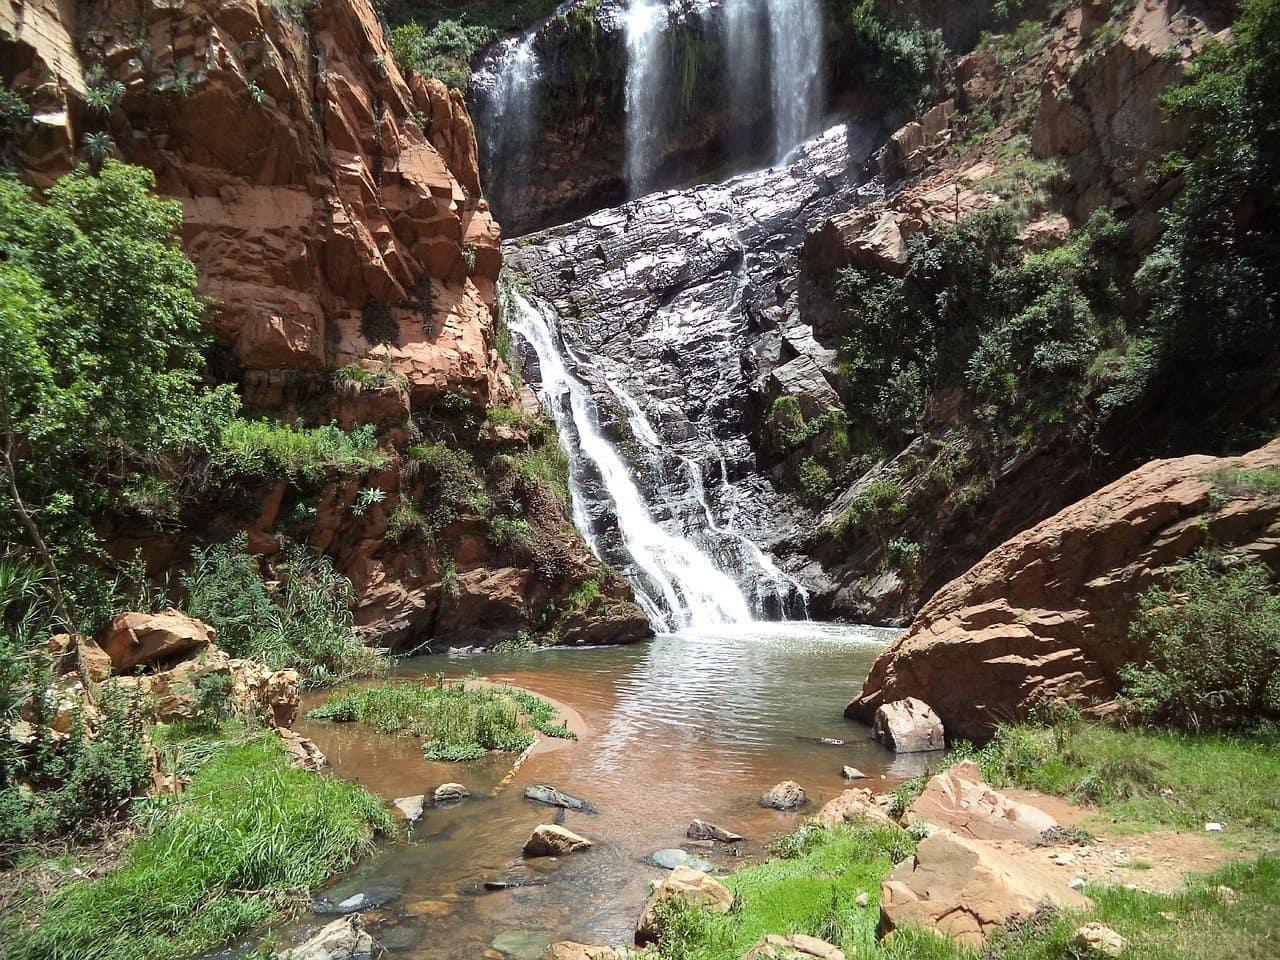 walter-sisulu-cascade-afrique-du-sud-decouverte